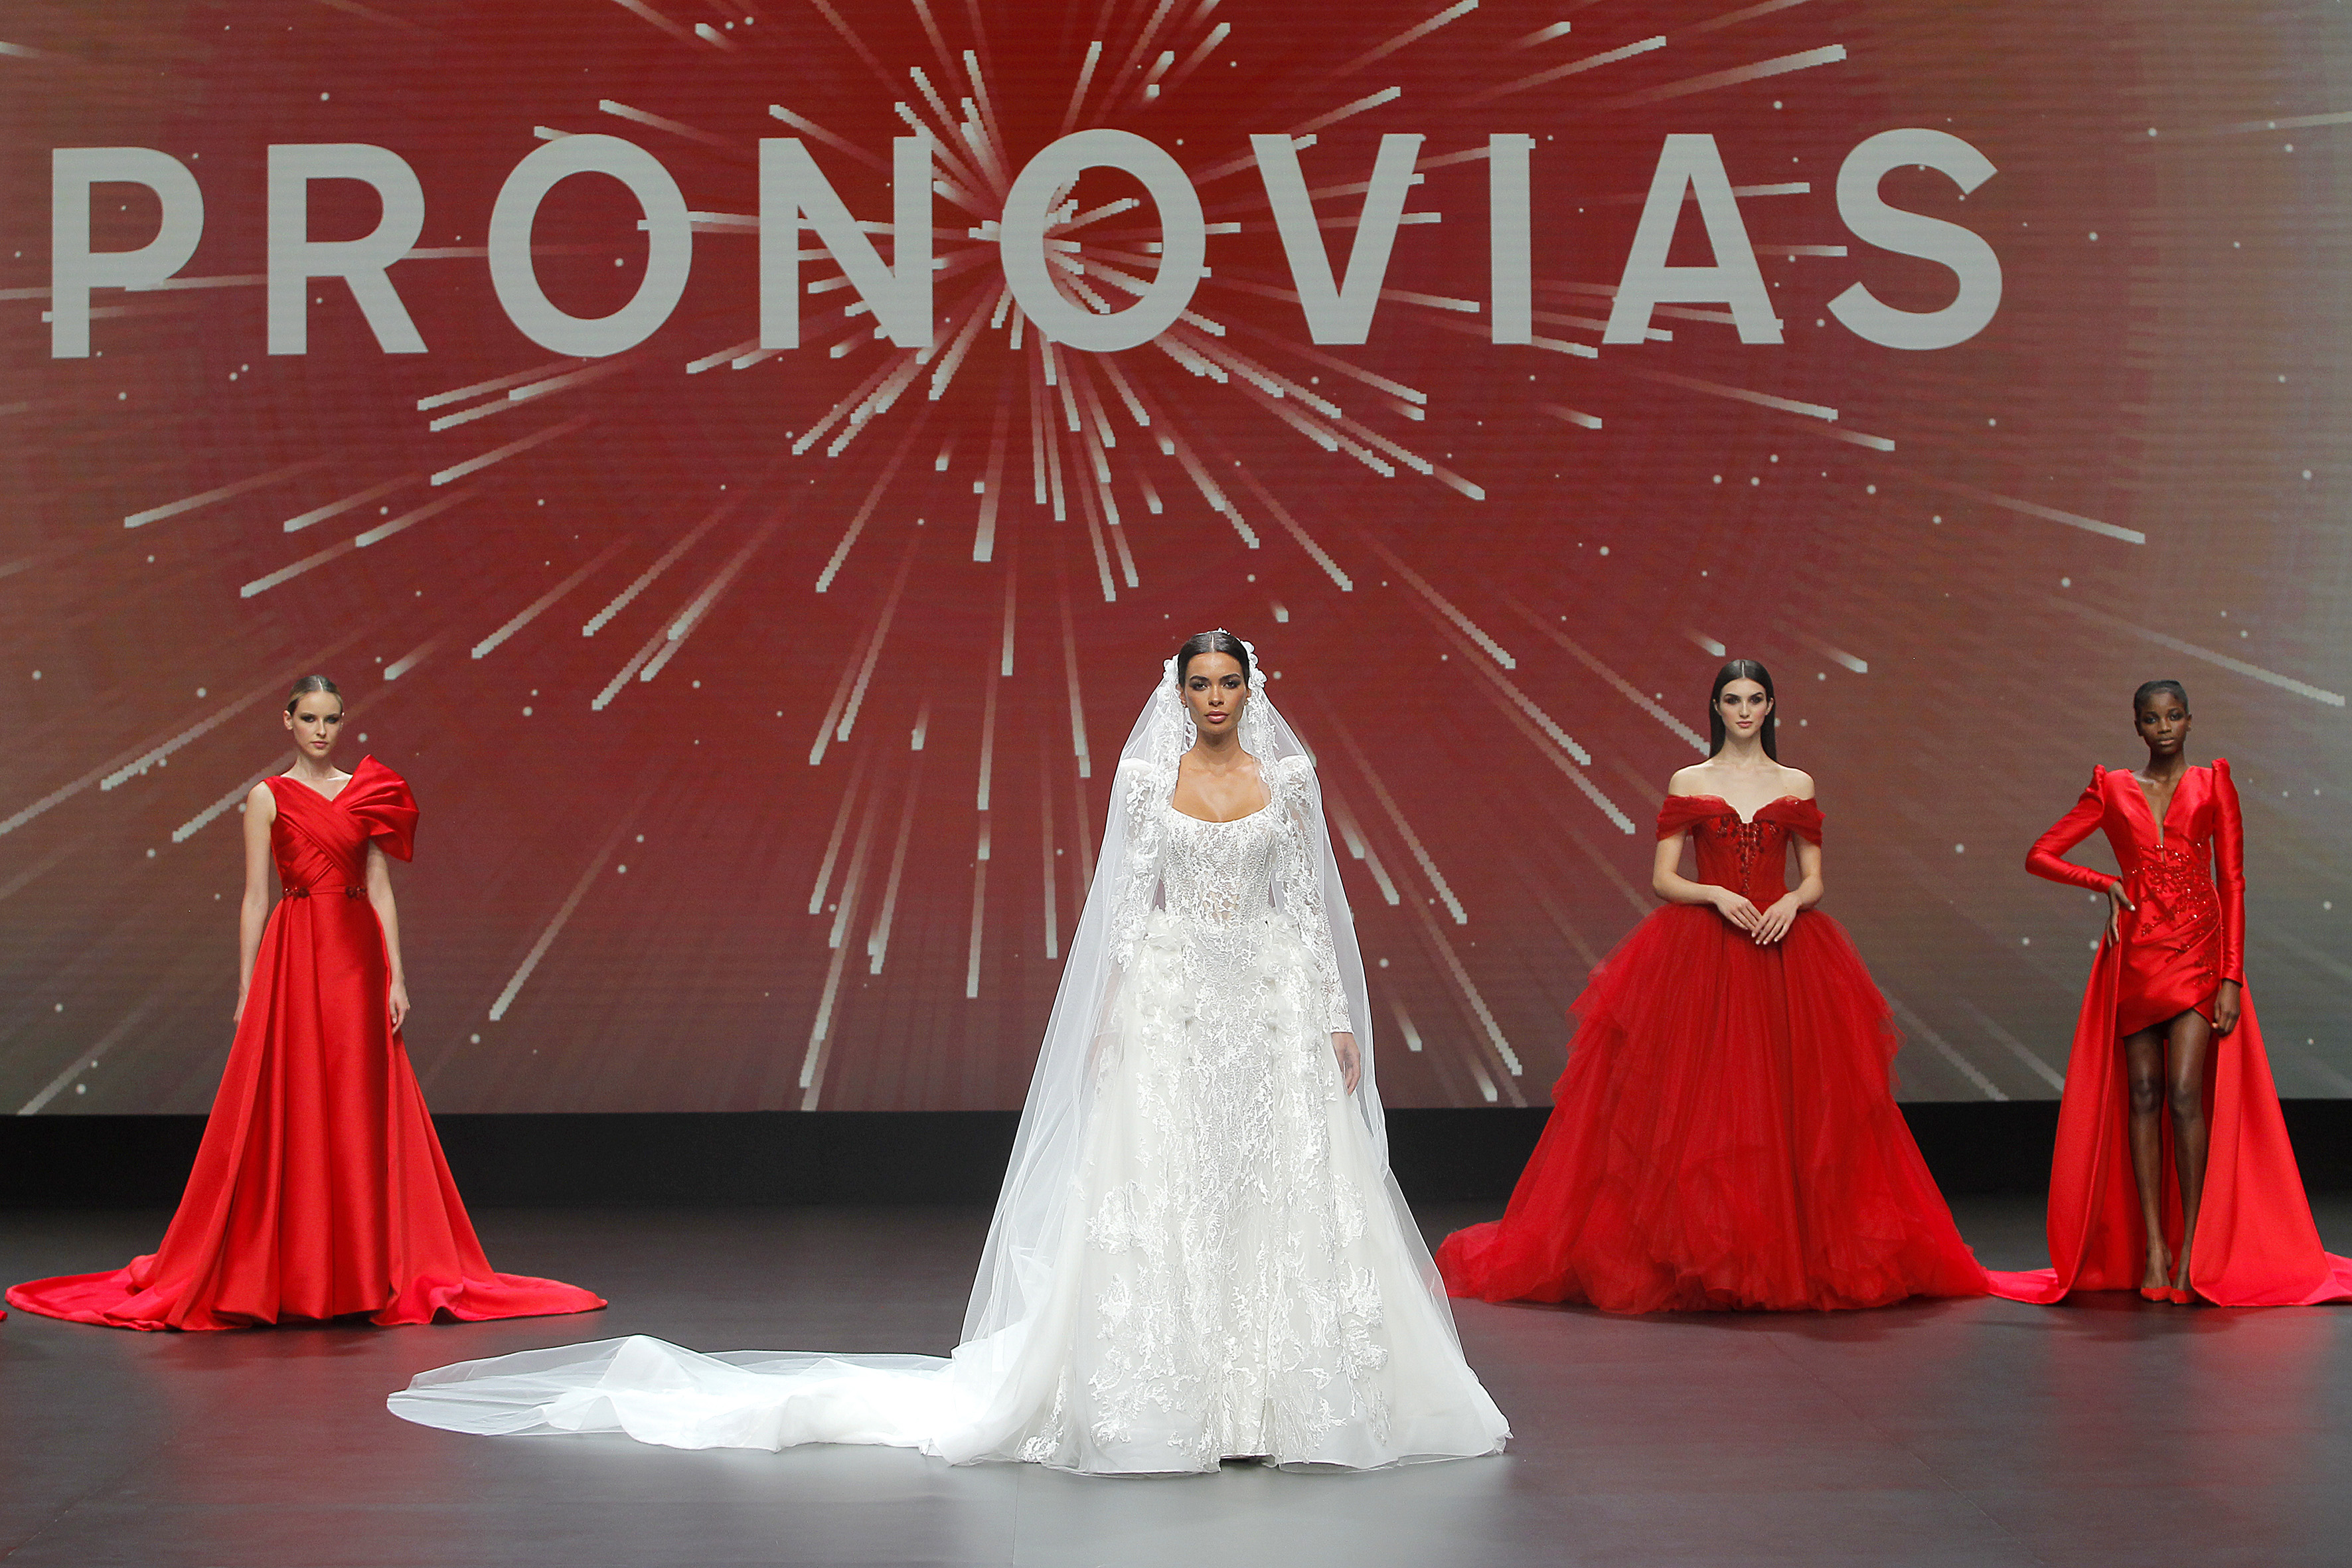 Desfile de Pronovias en VBBFW Digital Experience 2020g